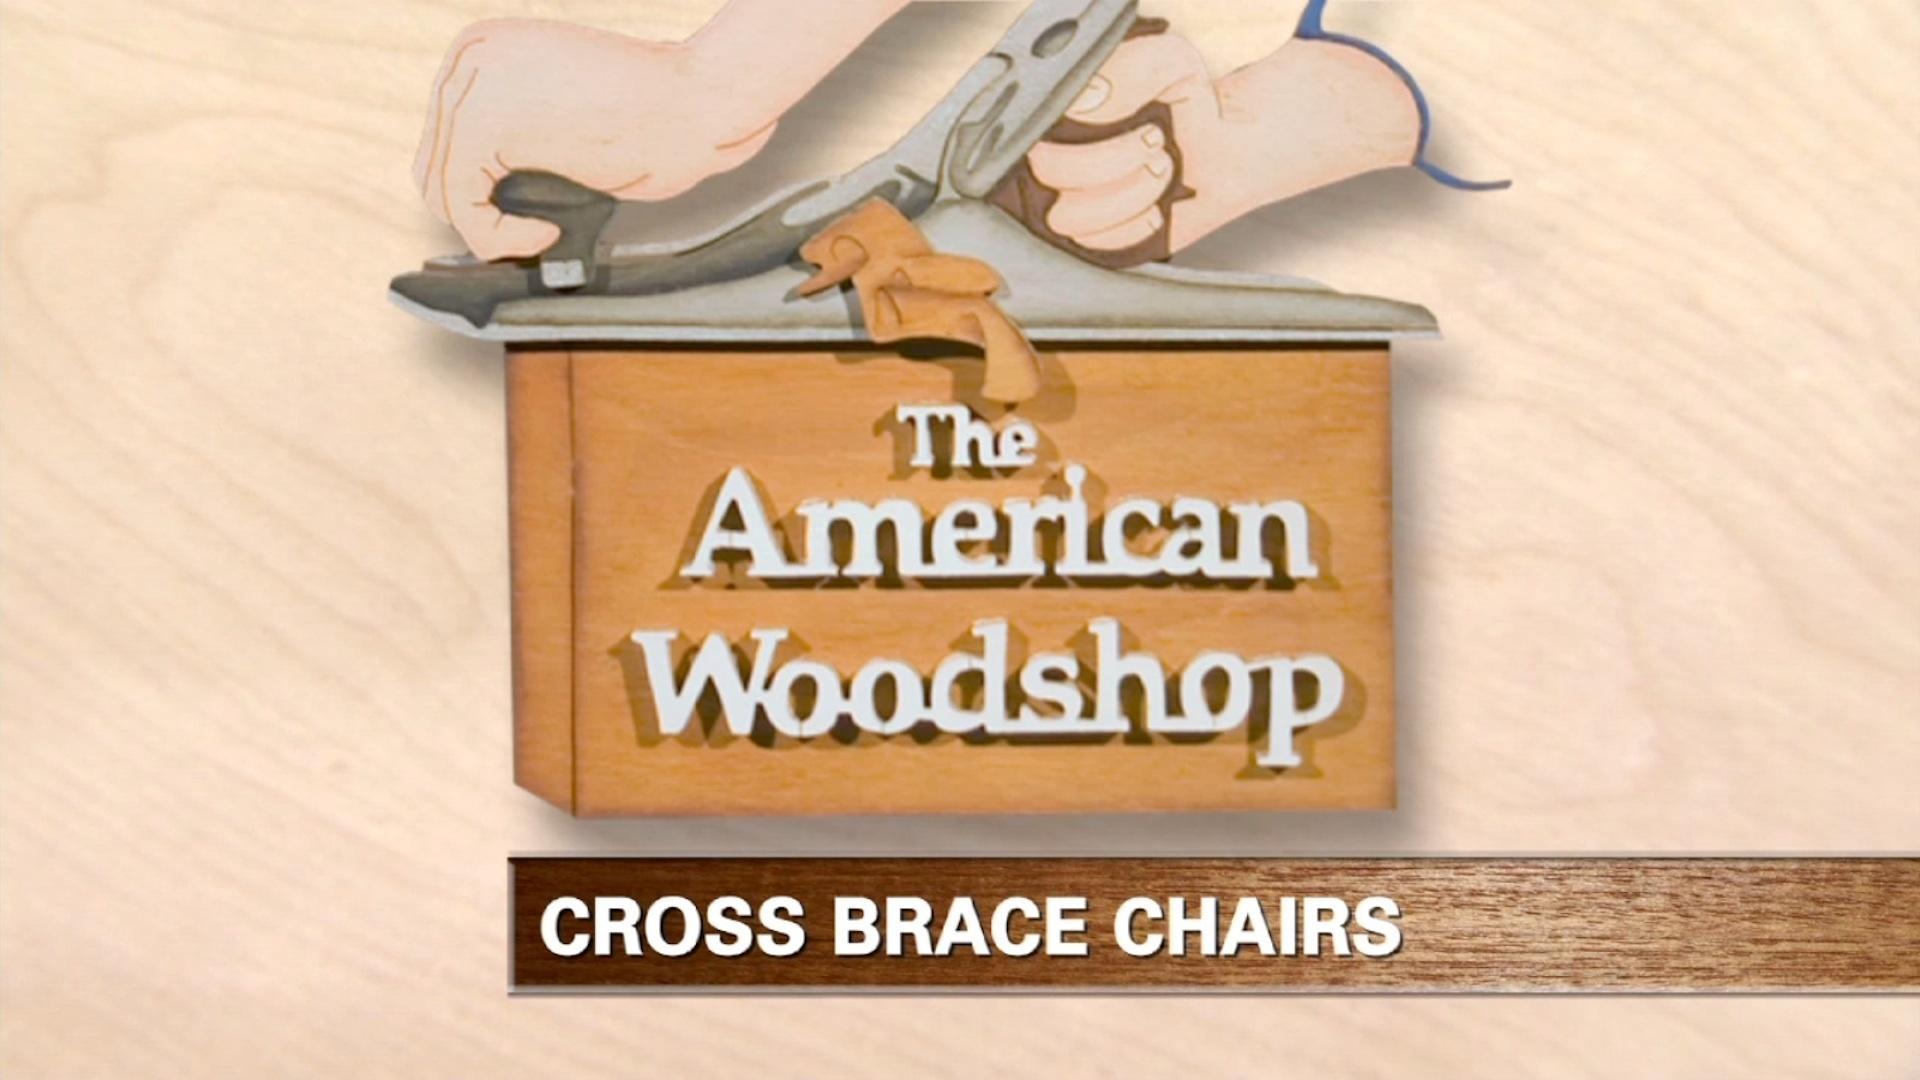 Remarkable American Woodshop Cross Brace Chair Web Extra Twin Interior Design Ideas Clesiryabchikinfo